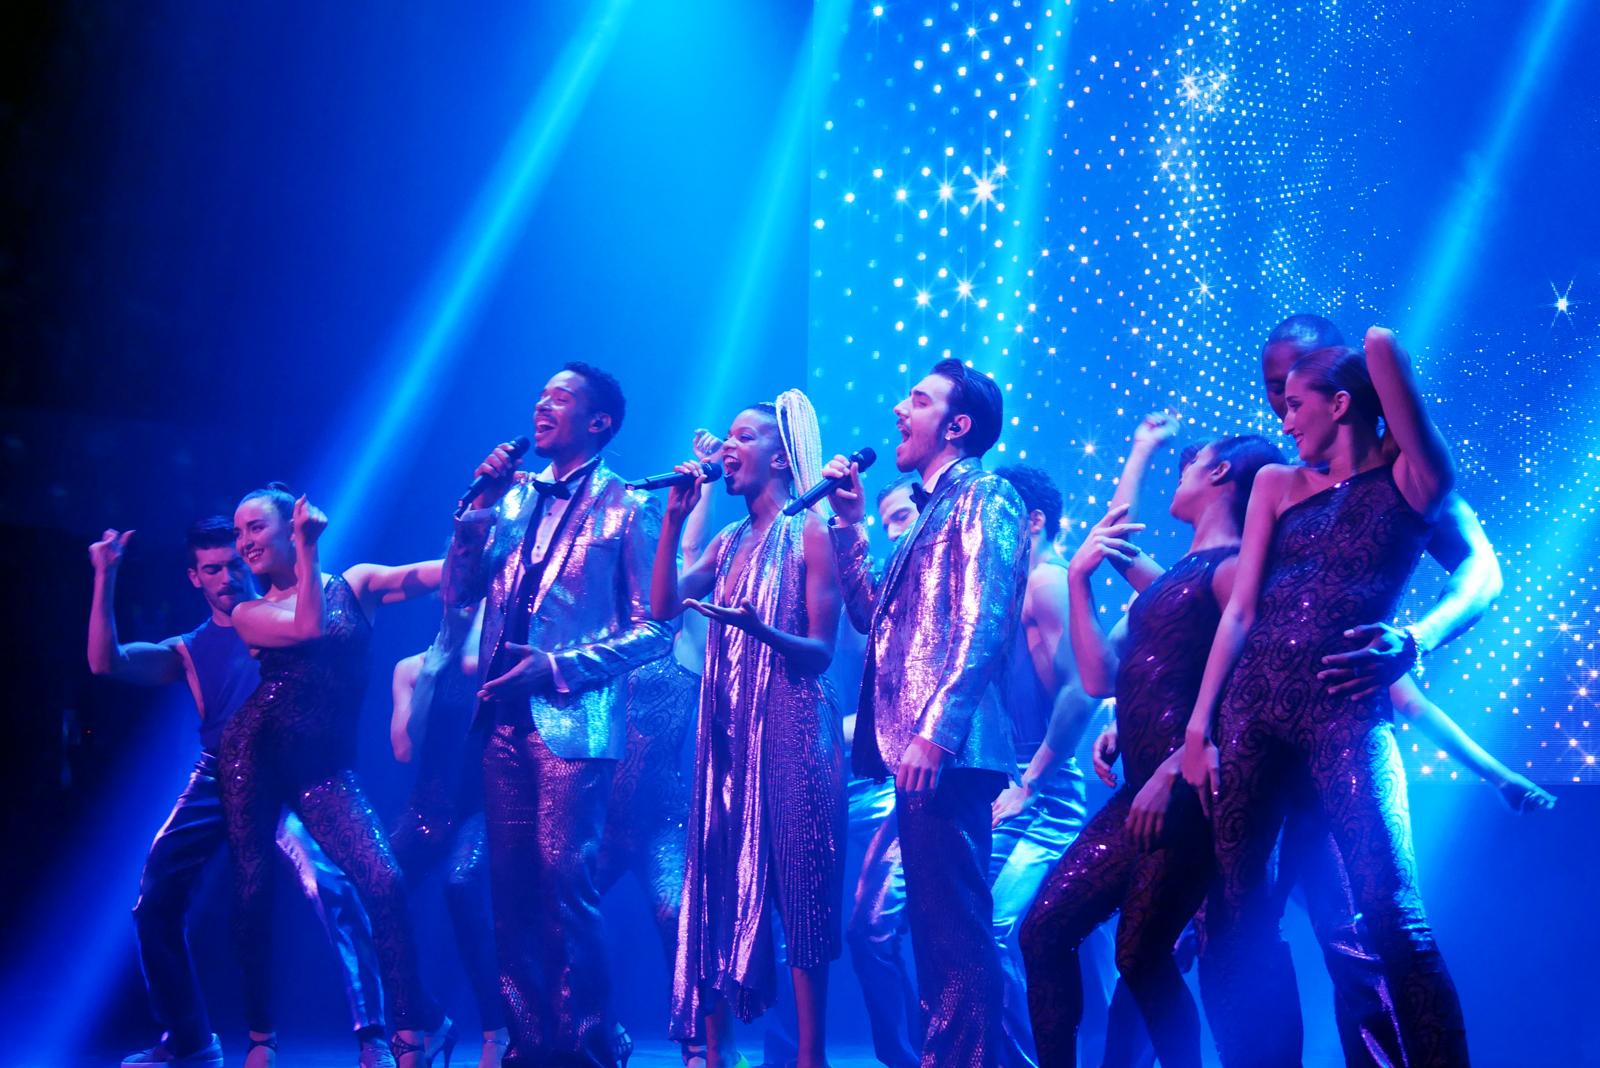 saturday-night-fever-le-spectacle-comedie-musicale-fievre-du-samedi-soir-chanteurs-danseurs-photo-scene-usofparis-blog